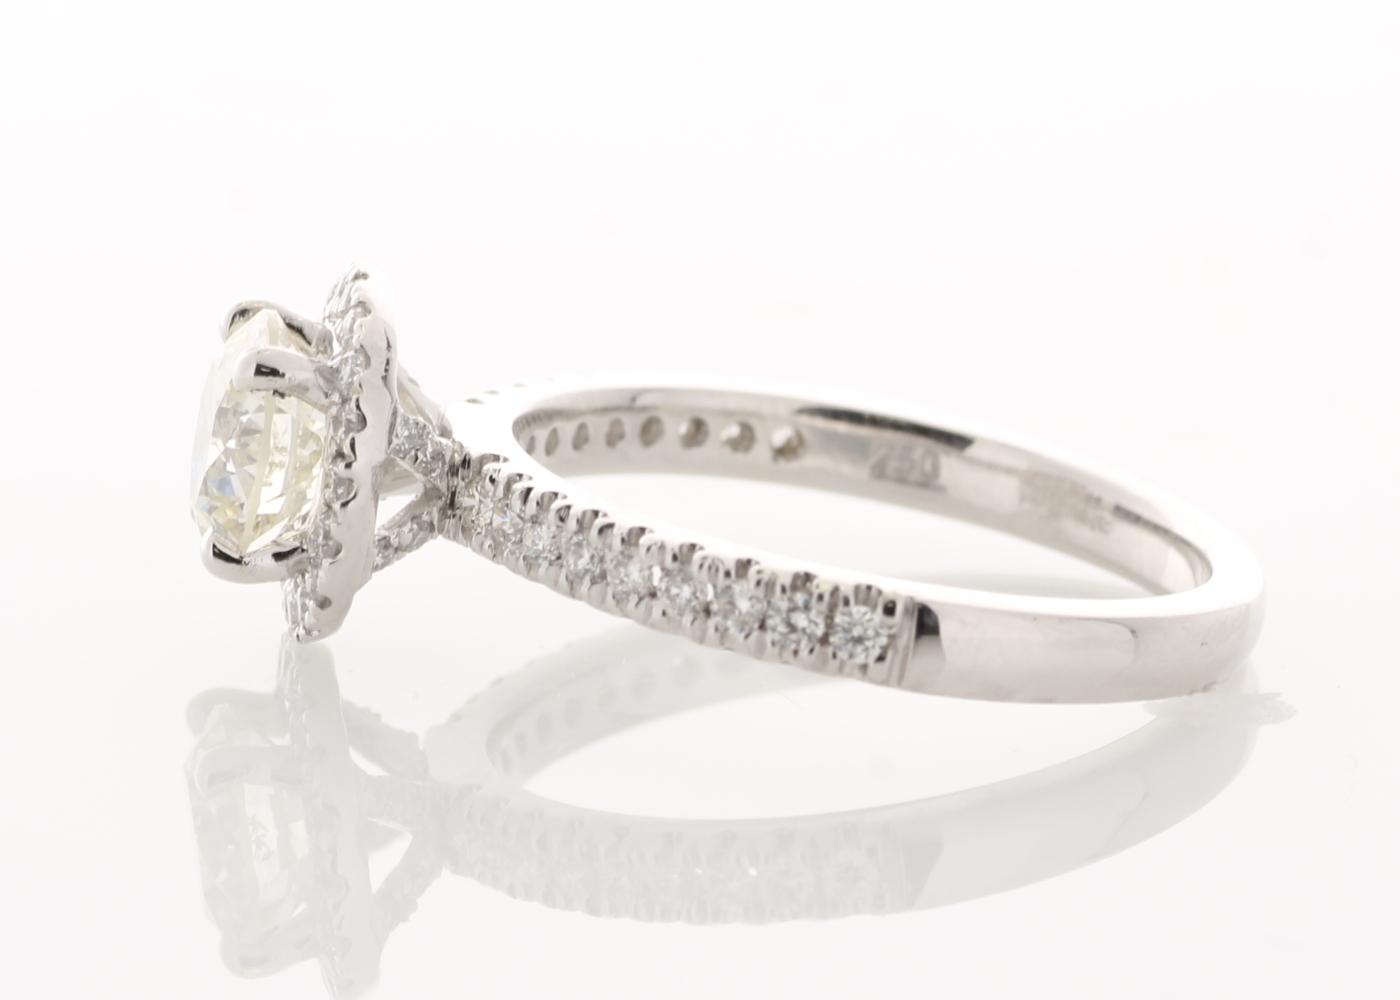 18ct White Gold Halo Set Ring 1.37 Carats - Image 2 of 5